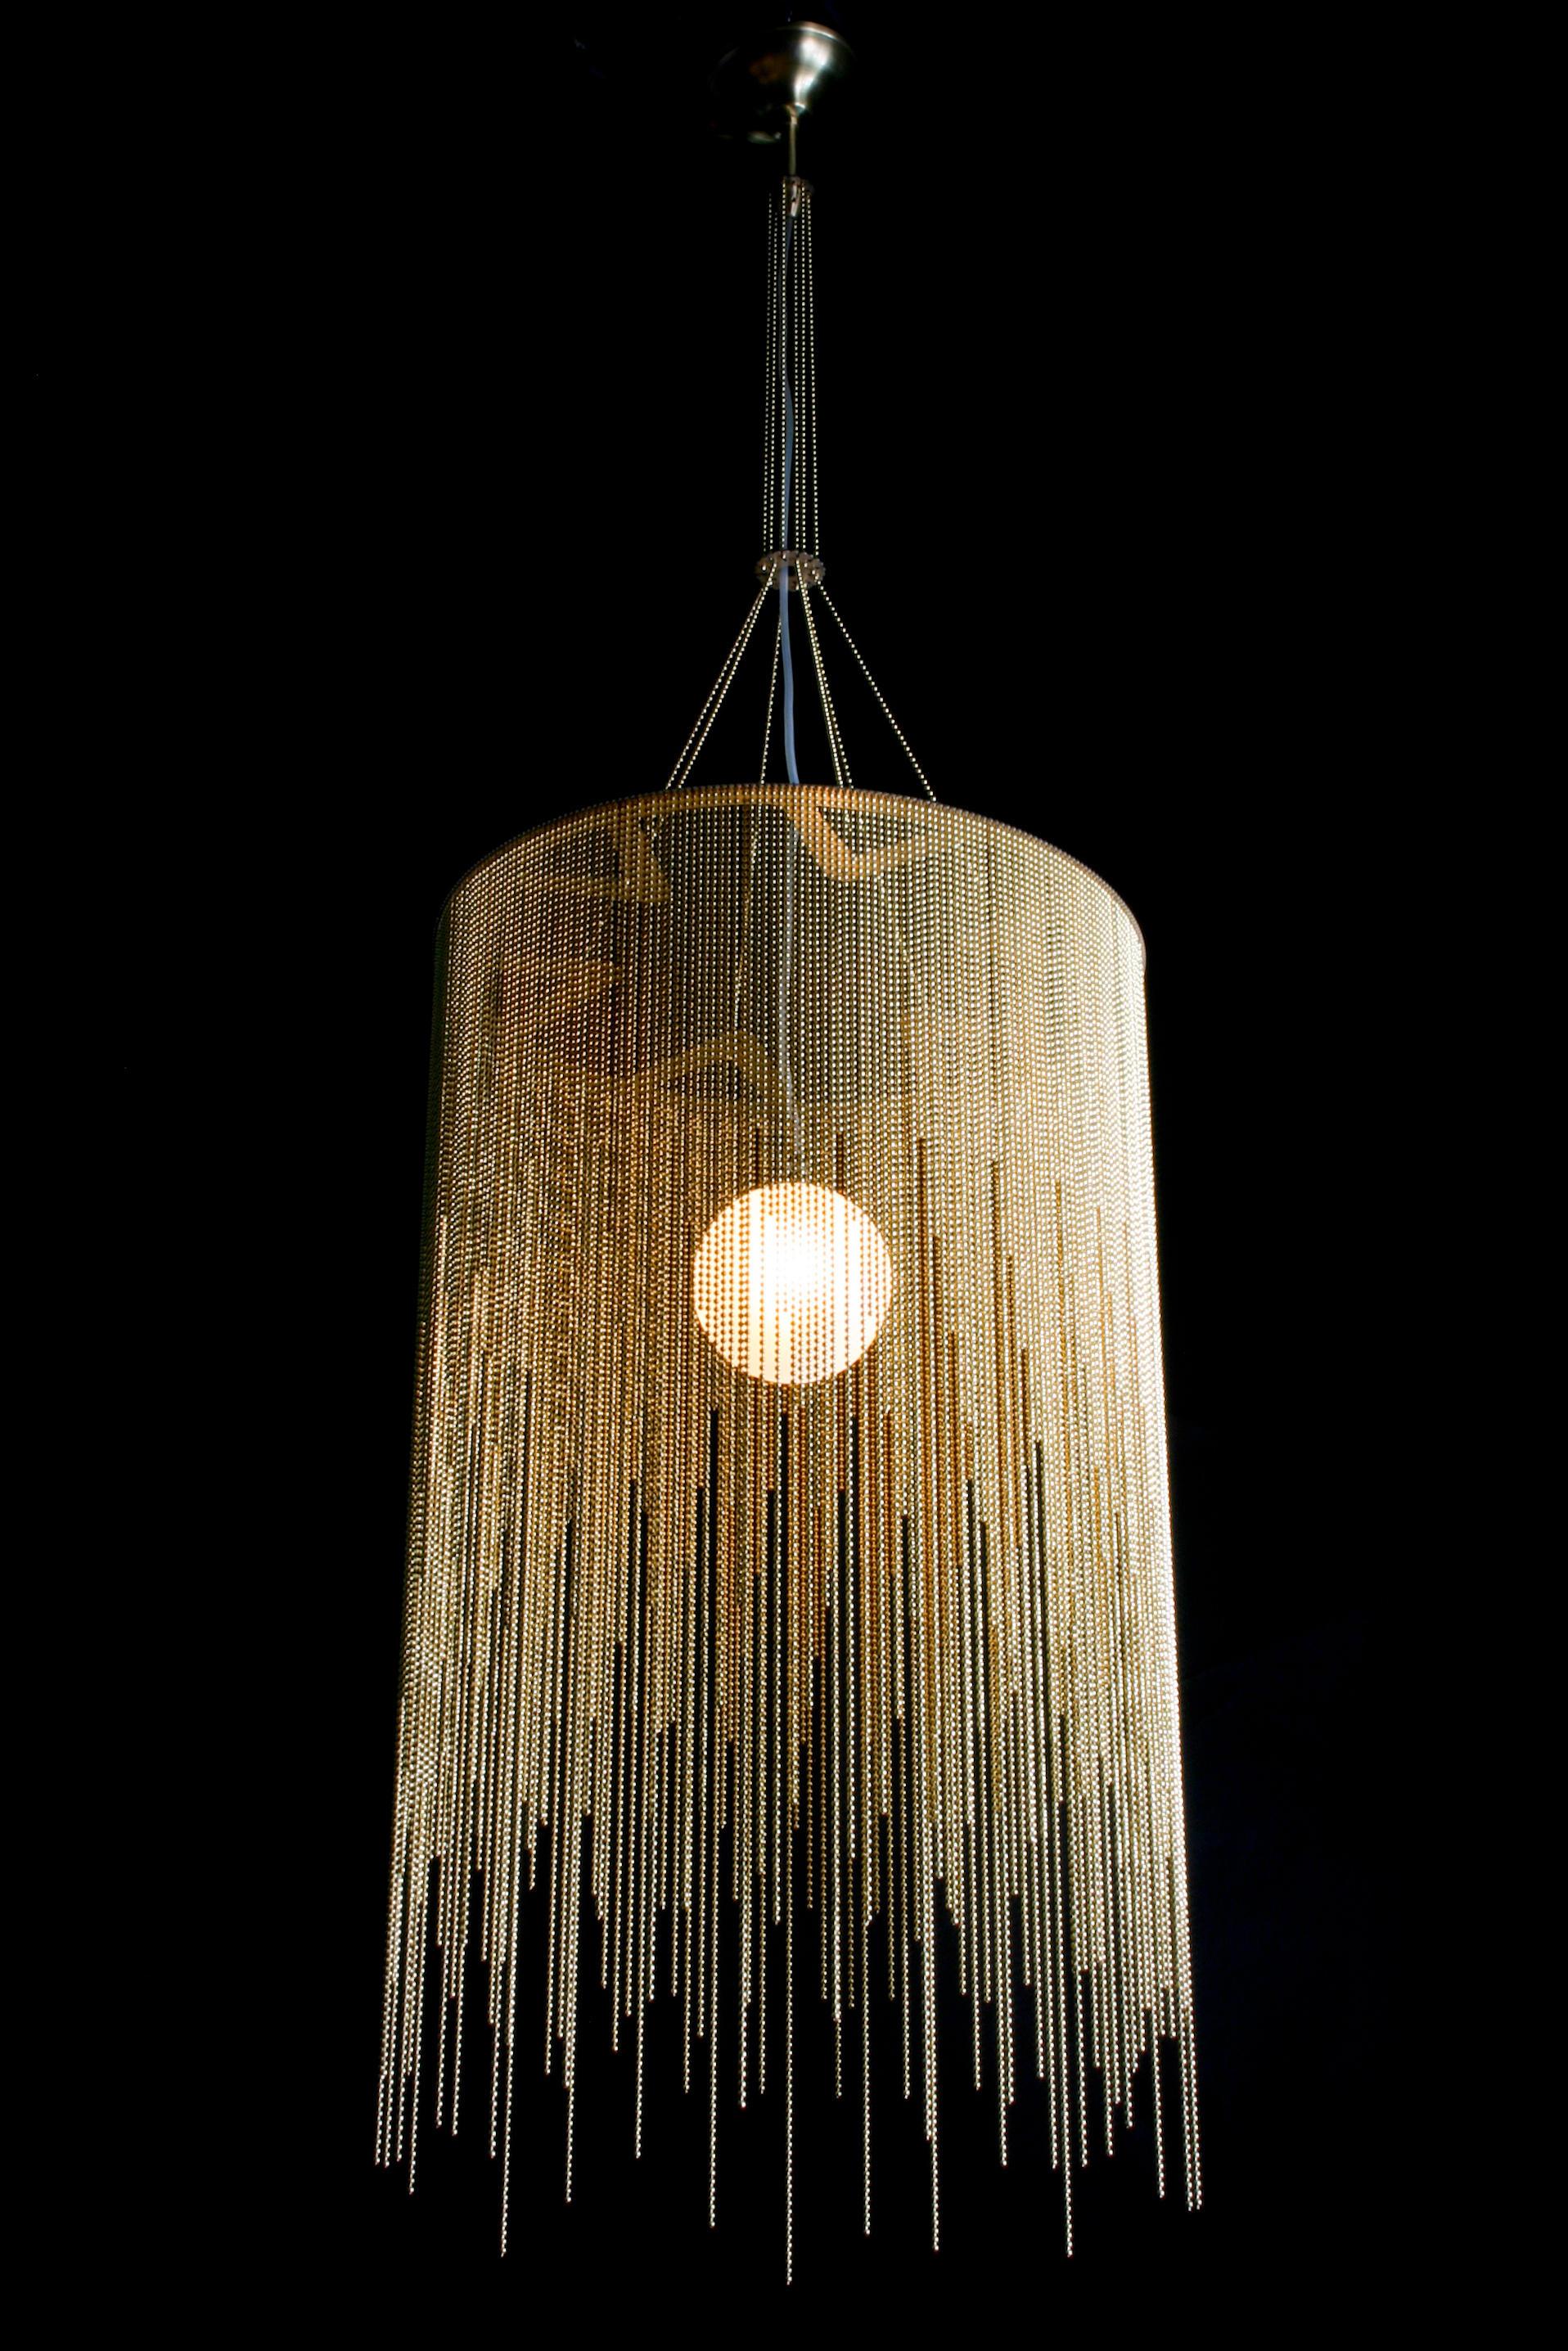 Circular Willow 400 Pendant Lamp - Pendelleuchten Von with Alverez 4-Light Drum Chandeliers (Image 7 of 30)